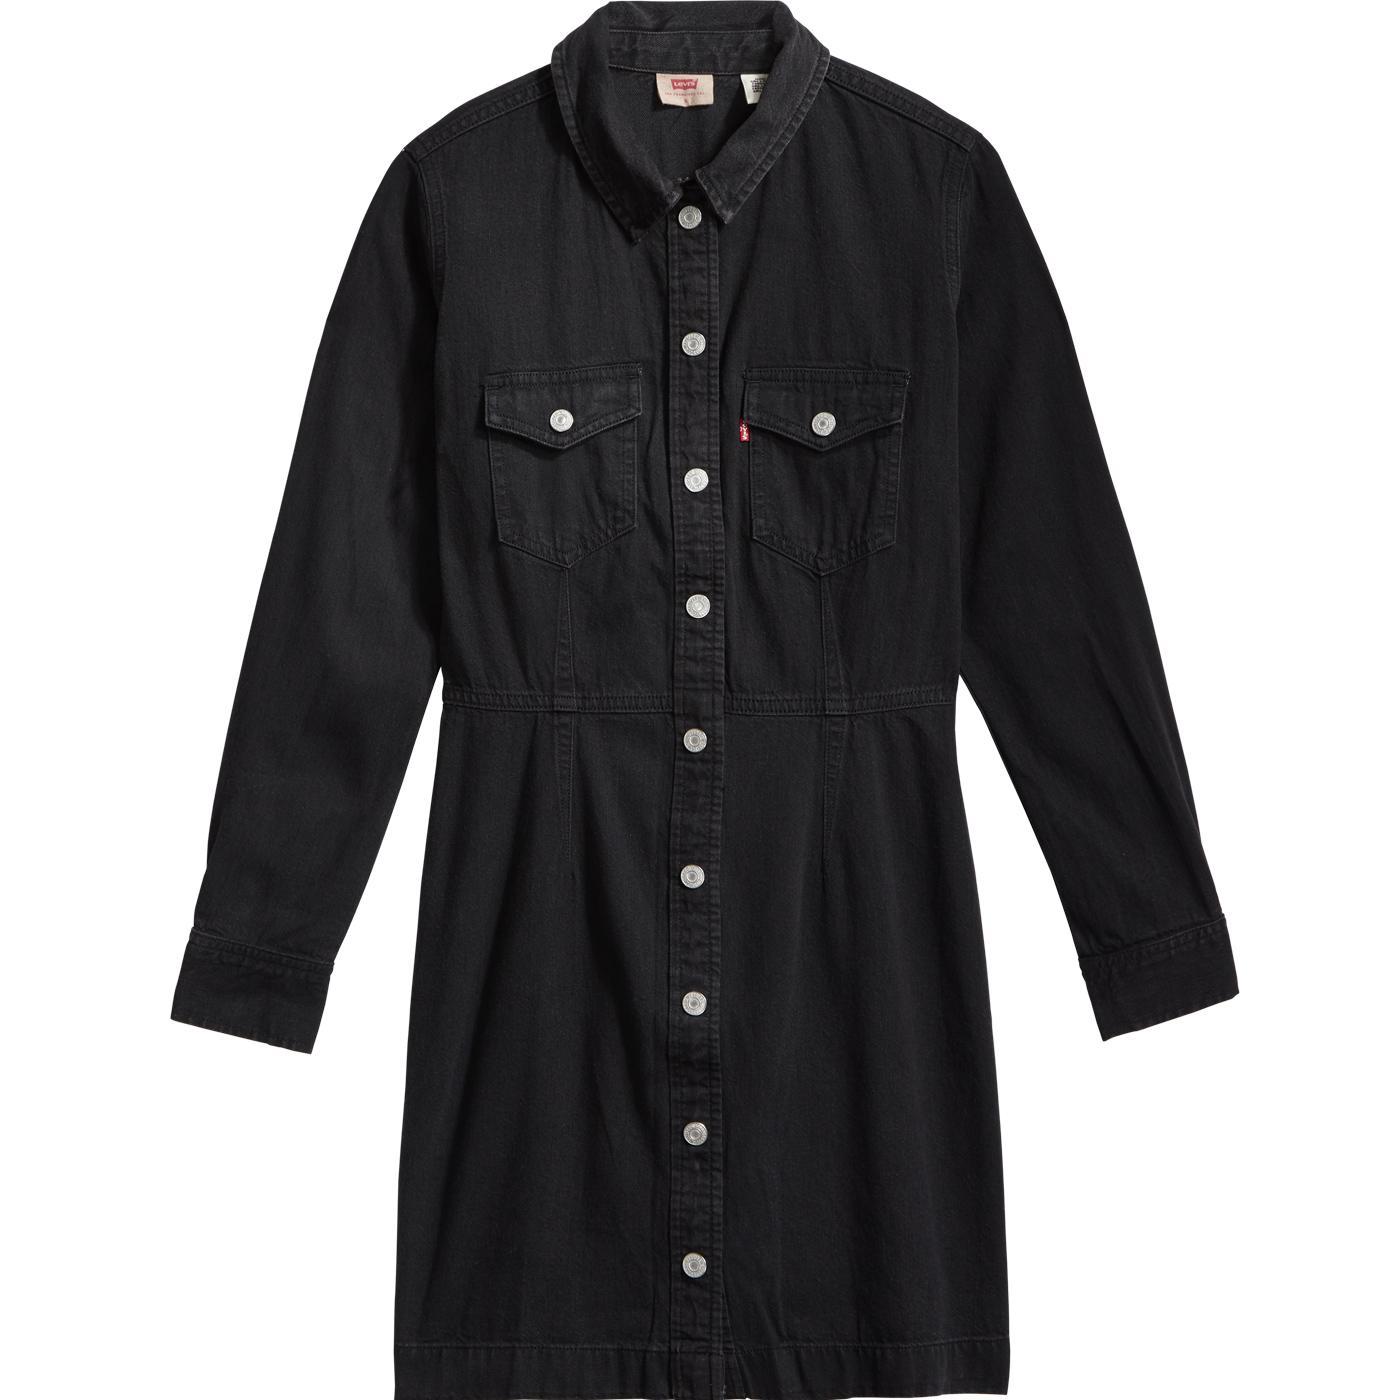 Ellie LEVI'S WOMENS Retro 70s Denim Dress in Black